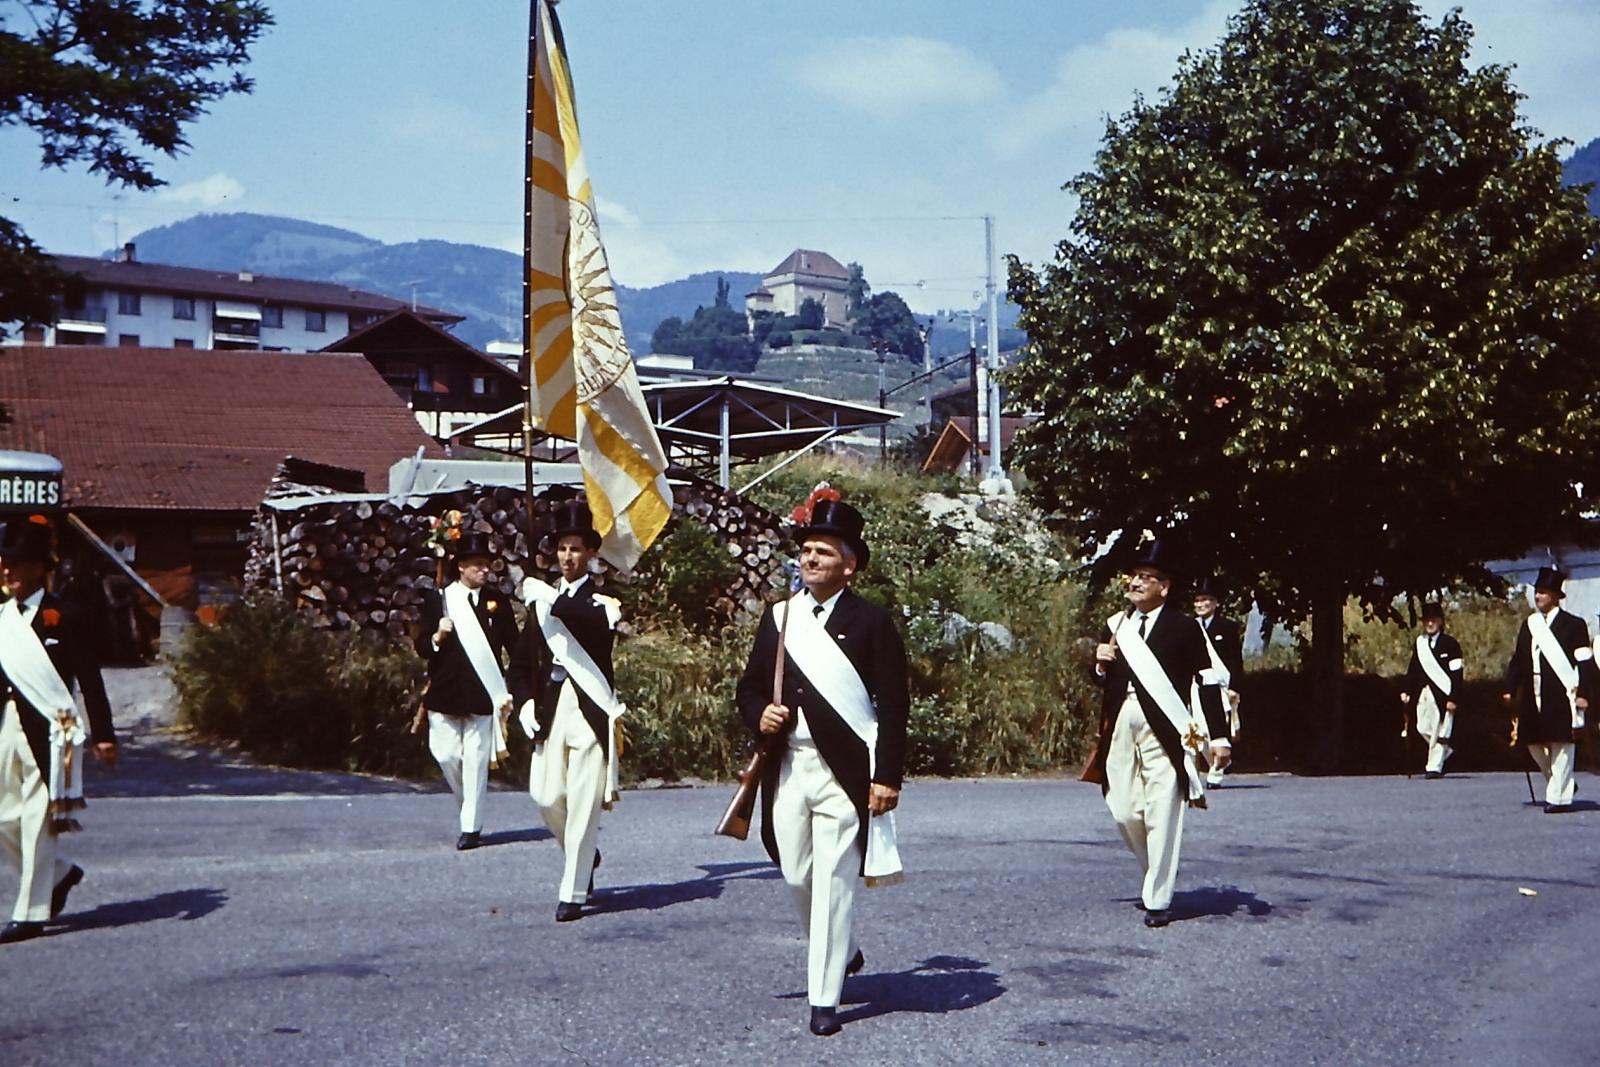 Parade de La Noble Abbaye des Echarpes blanches.